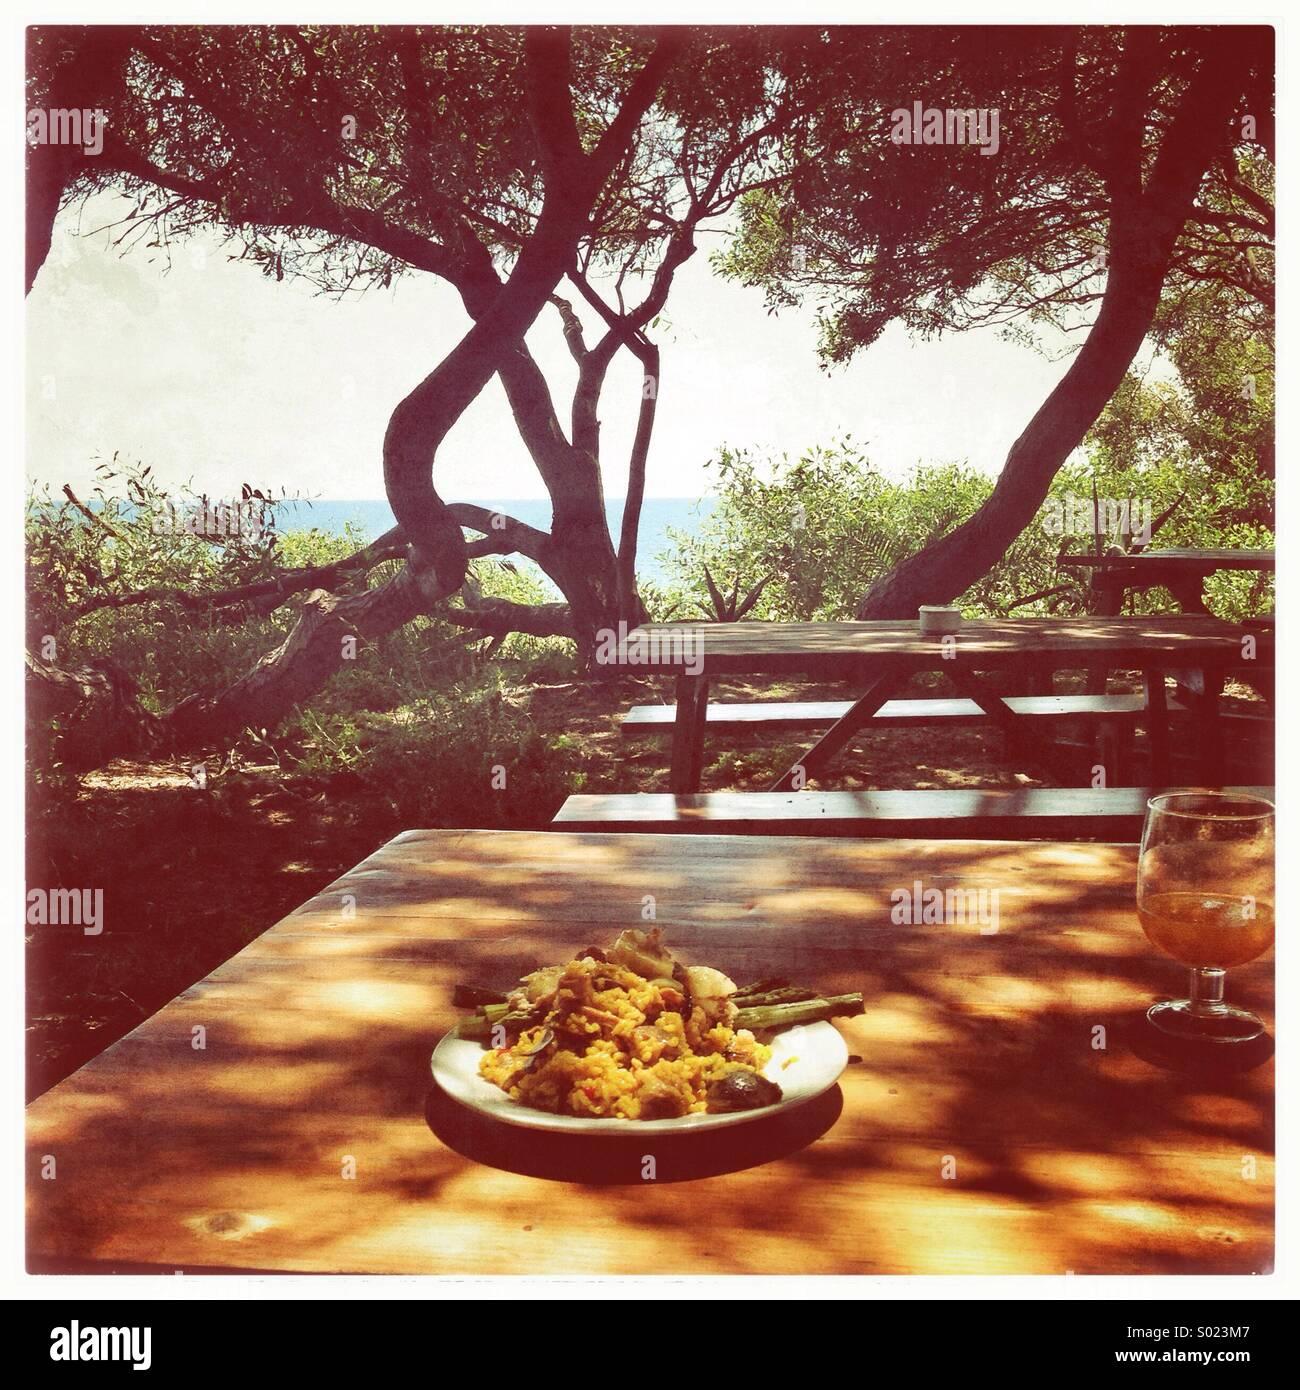 Mittagessen unter den Bäumen am Meer Stockbild